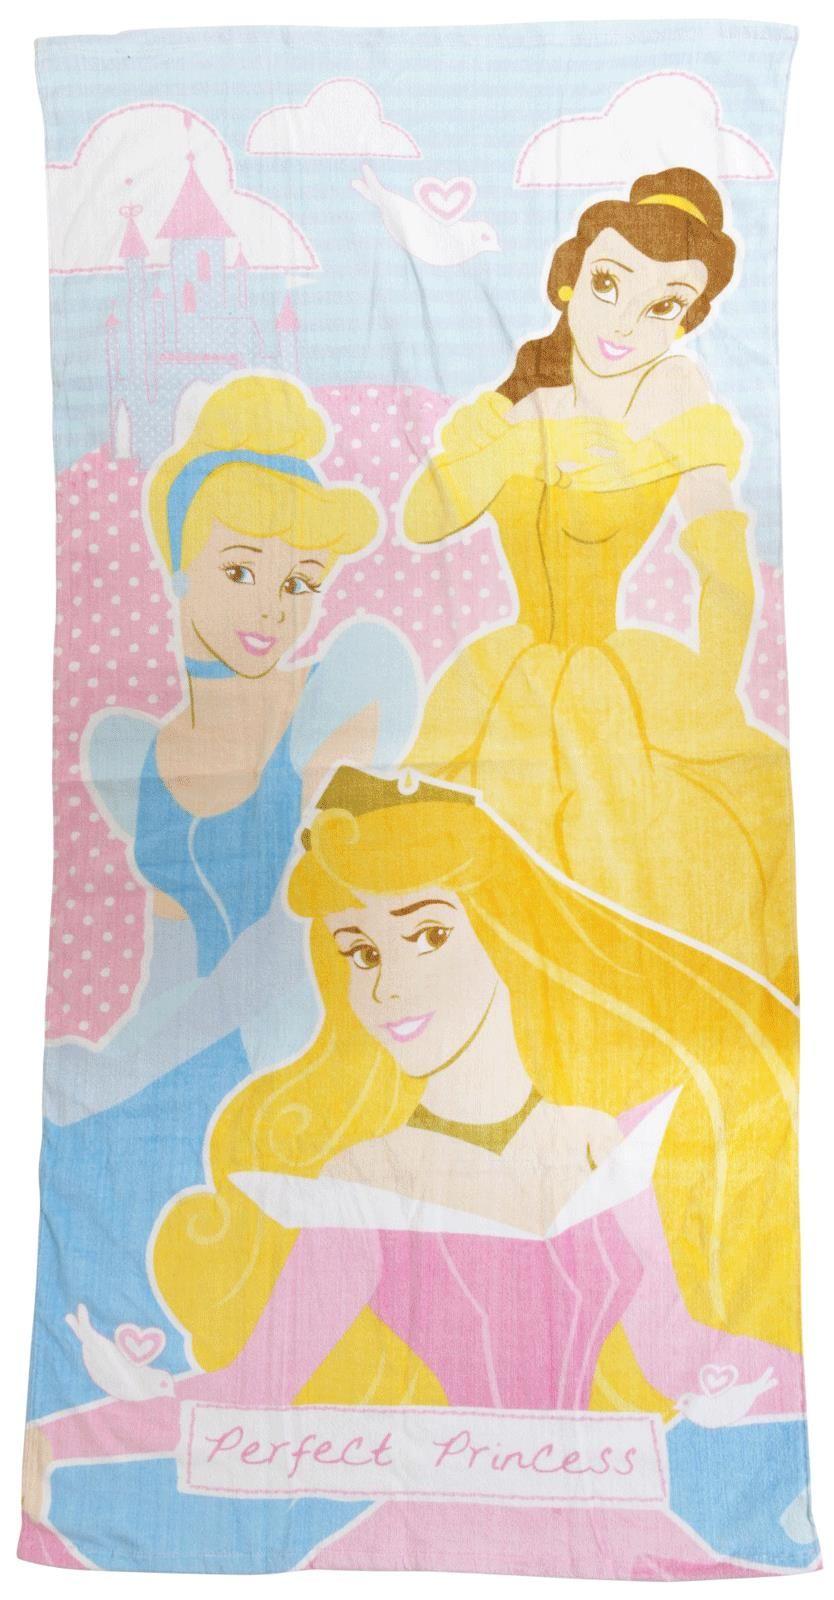 Princess Perfect Princess Beach Bath Towel | Beach and Bath Towels ...